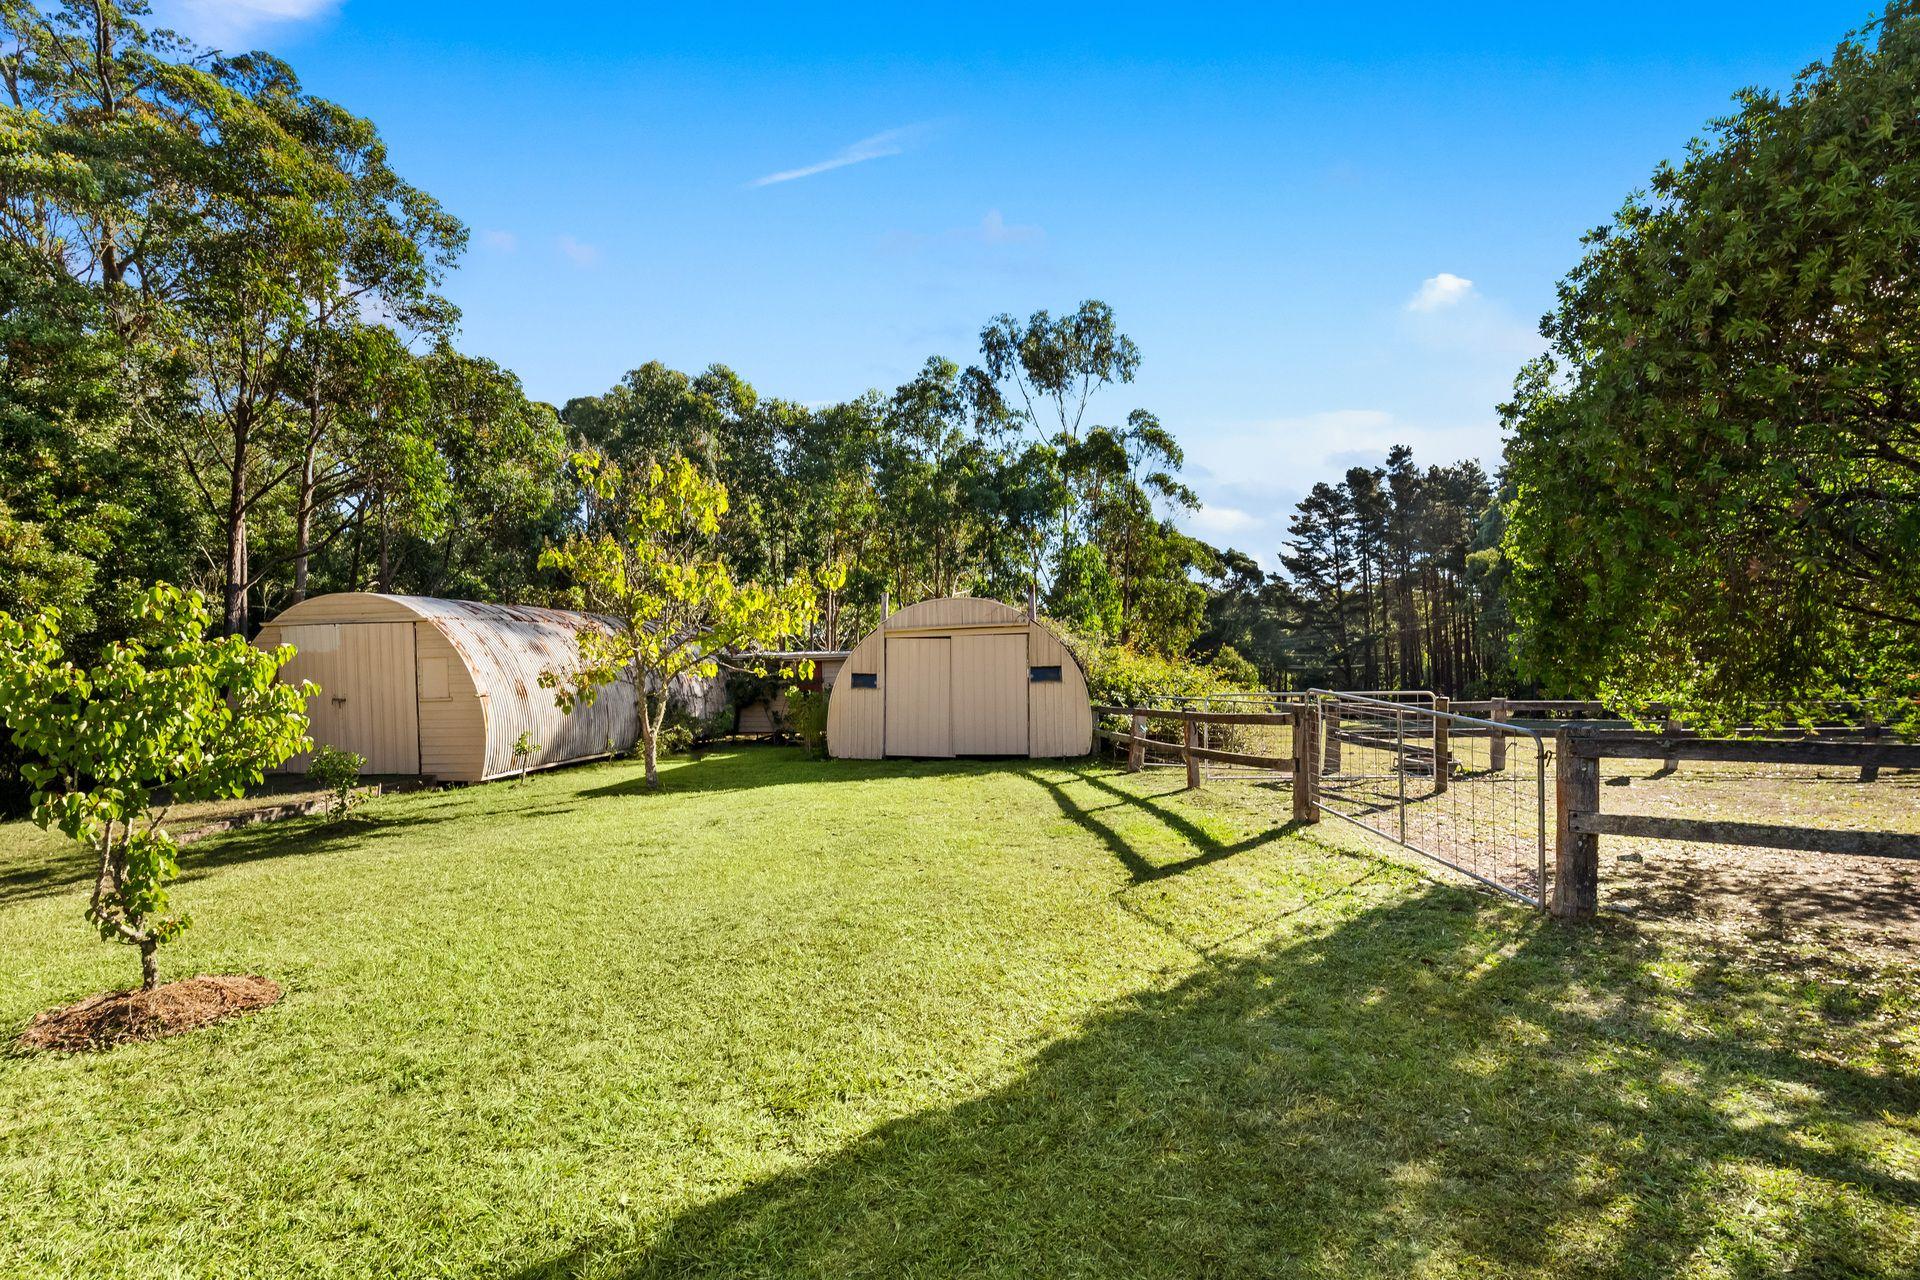 1165 Sheepwash Road, Avoca NSW 2577 Rural Property For